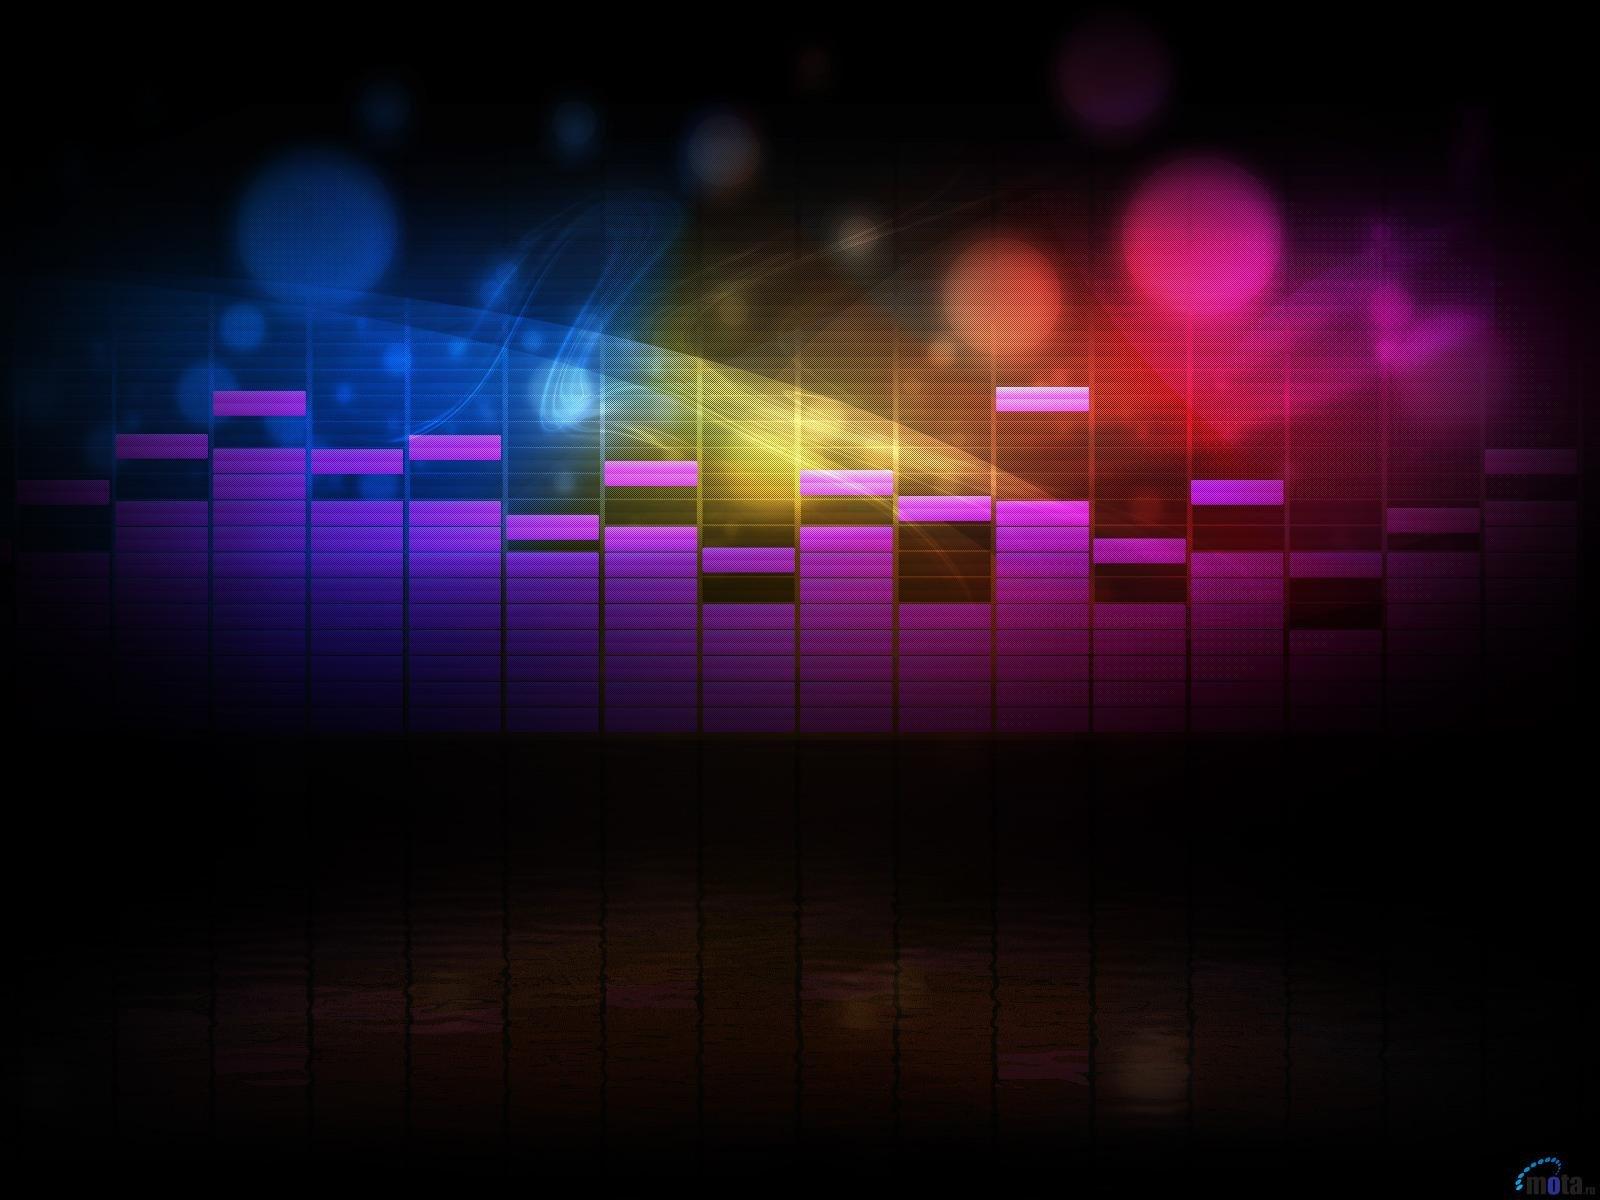 Download Wallpaper Sound Block 1600 x 1200 Desktop wallpapers and